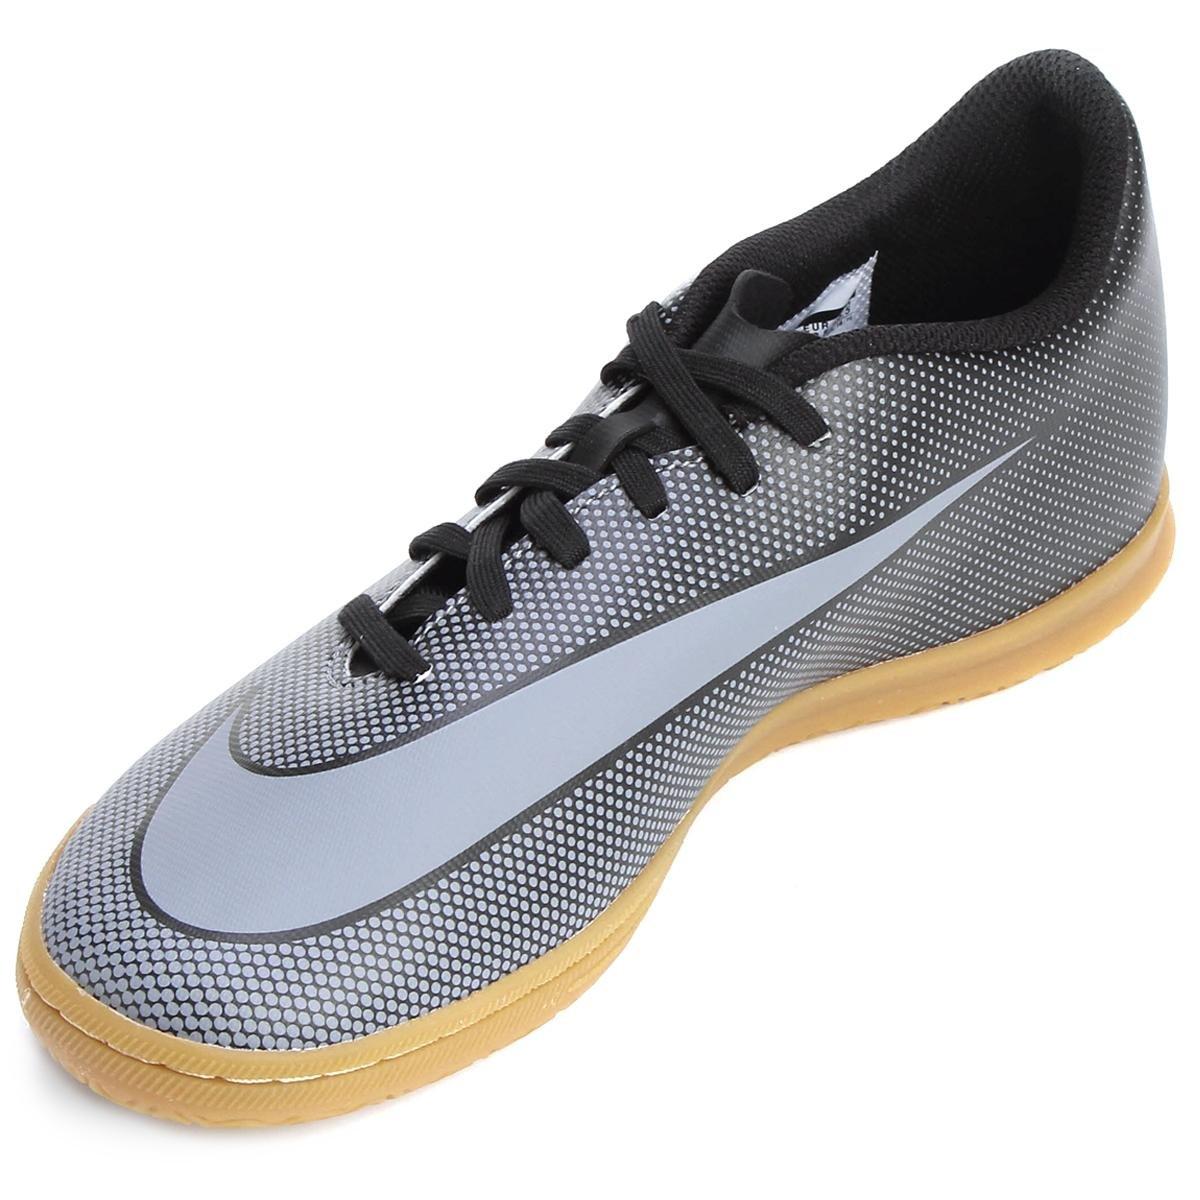 Chuteira Futsal Nike Bravata 2 IC - Compre Agora  82749cefc10b7